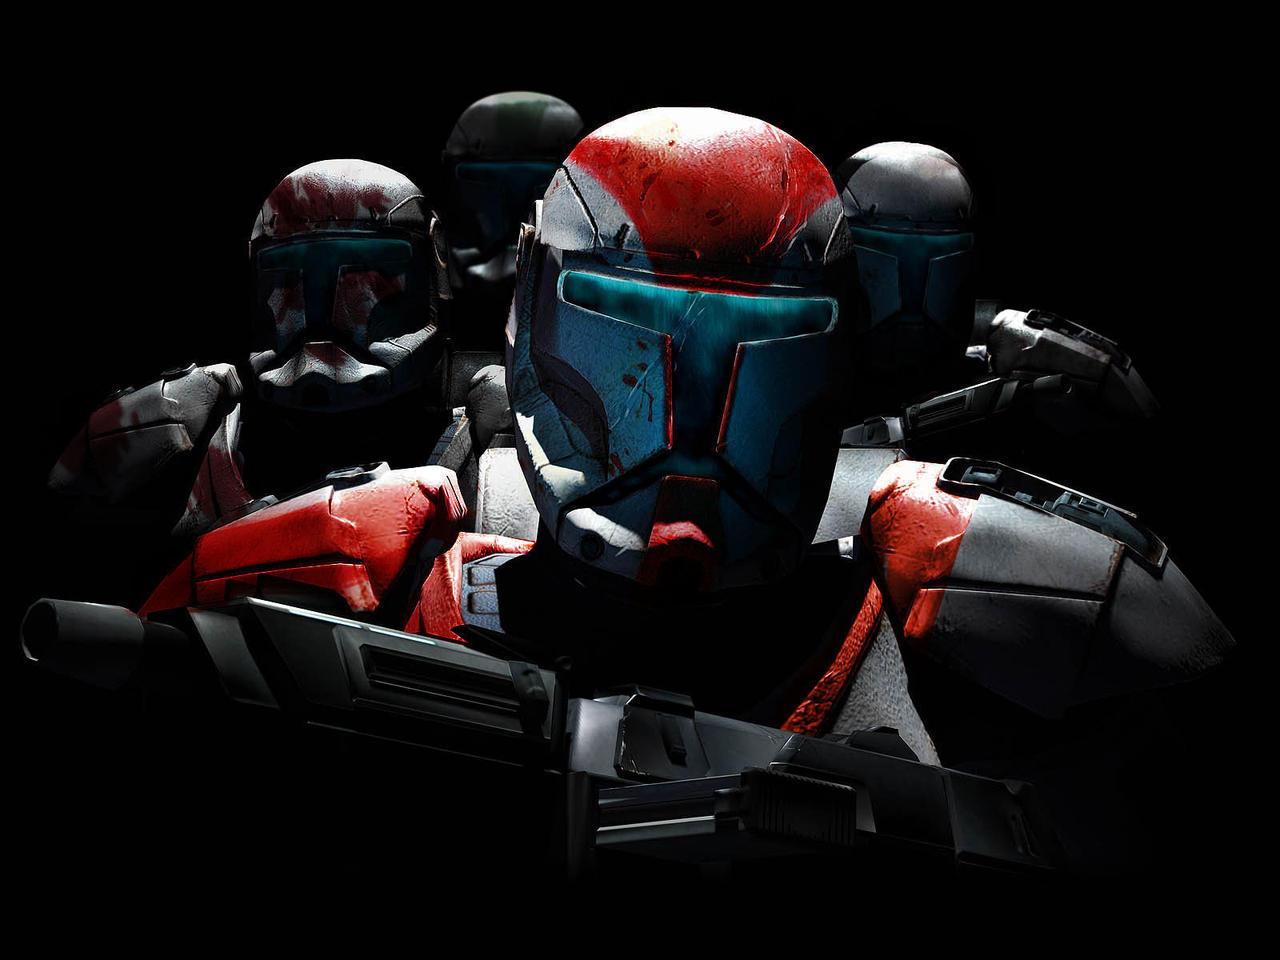 Delta Squad Star Wars Republic Commando By Redmcrmy On Deviantart